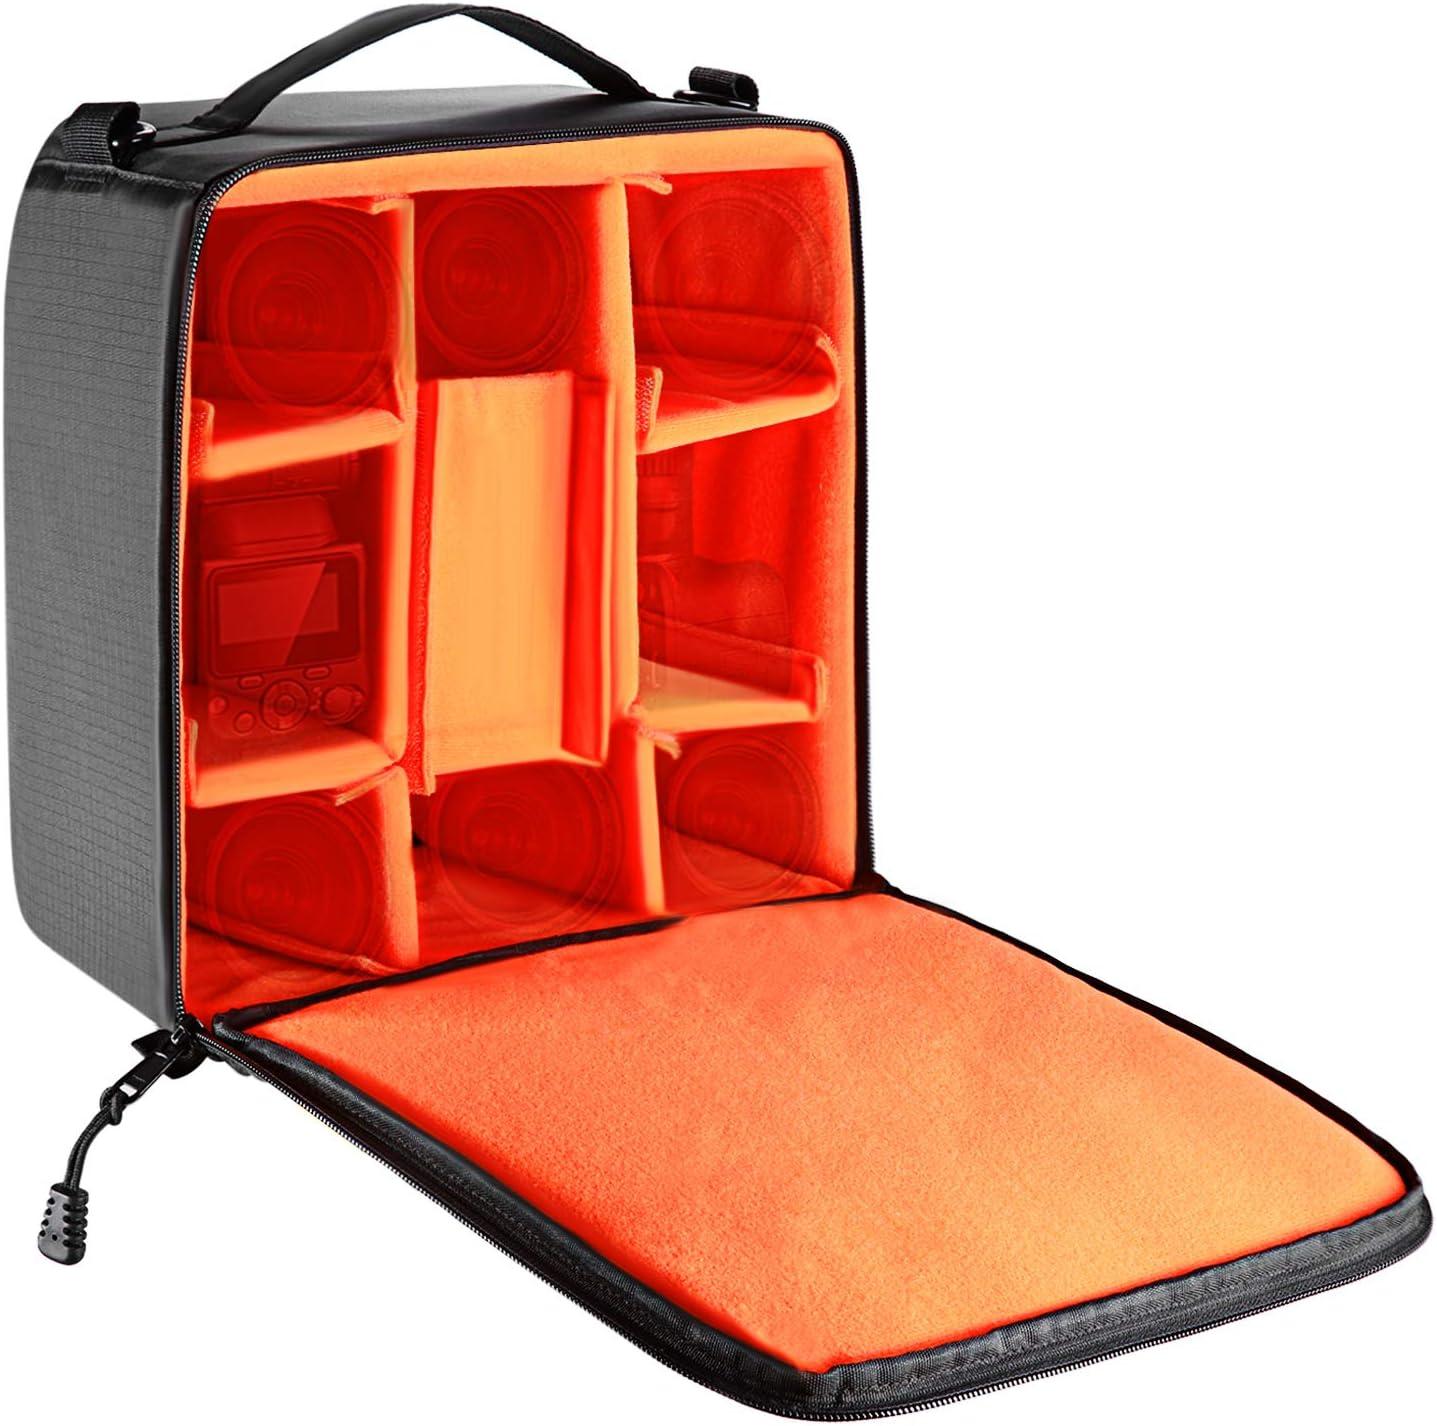 Neewer® Impermeable A prueba de golpes Flexible Cámara partición acolchado bolsa para SLR DSLR inserte protección asa superior bolso bandolera para cámaras sin espejo y lentes, luz de flash, radios di